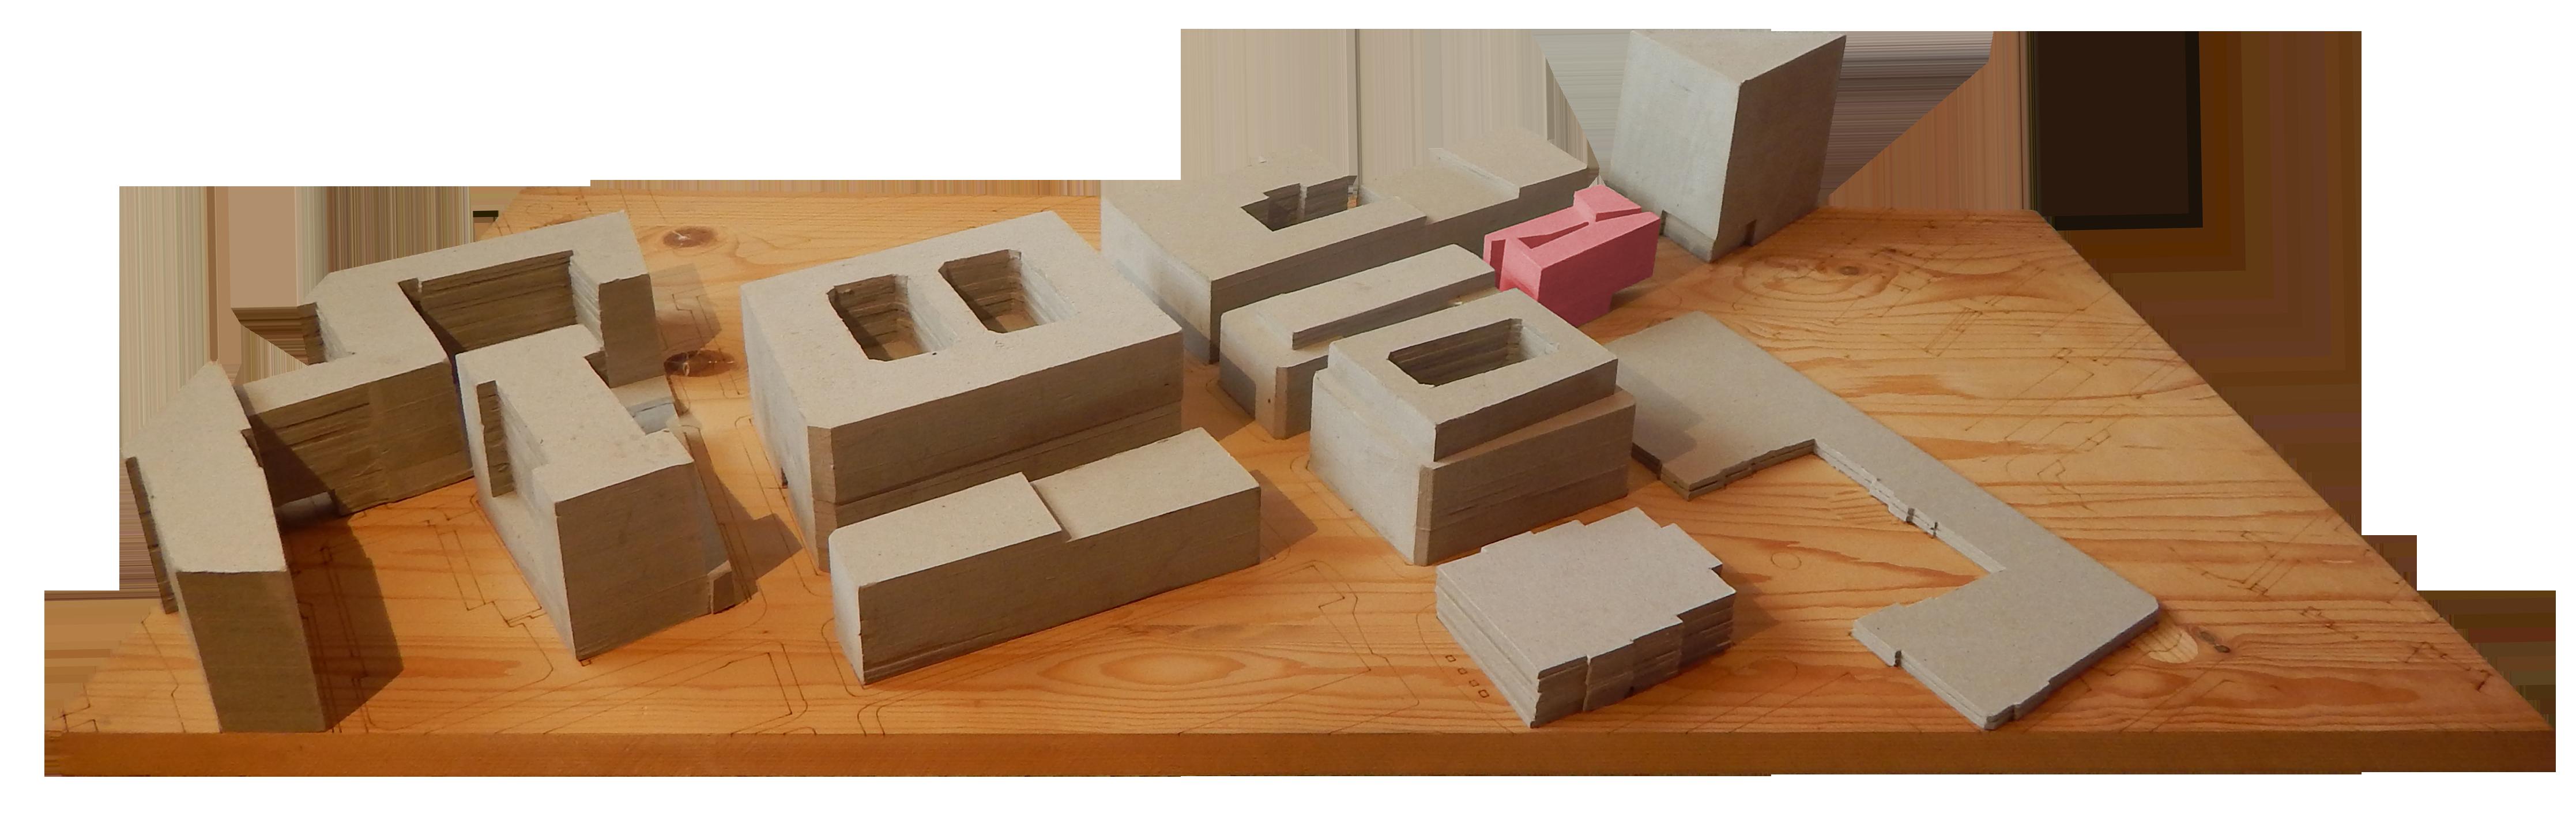 site-model